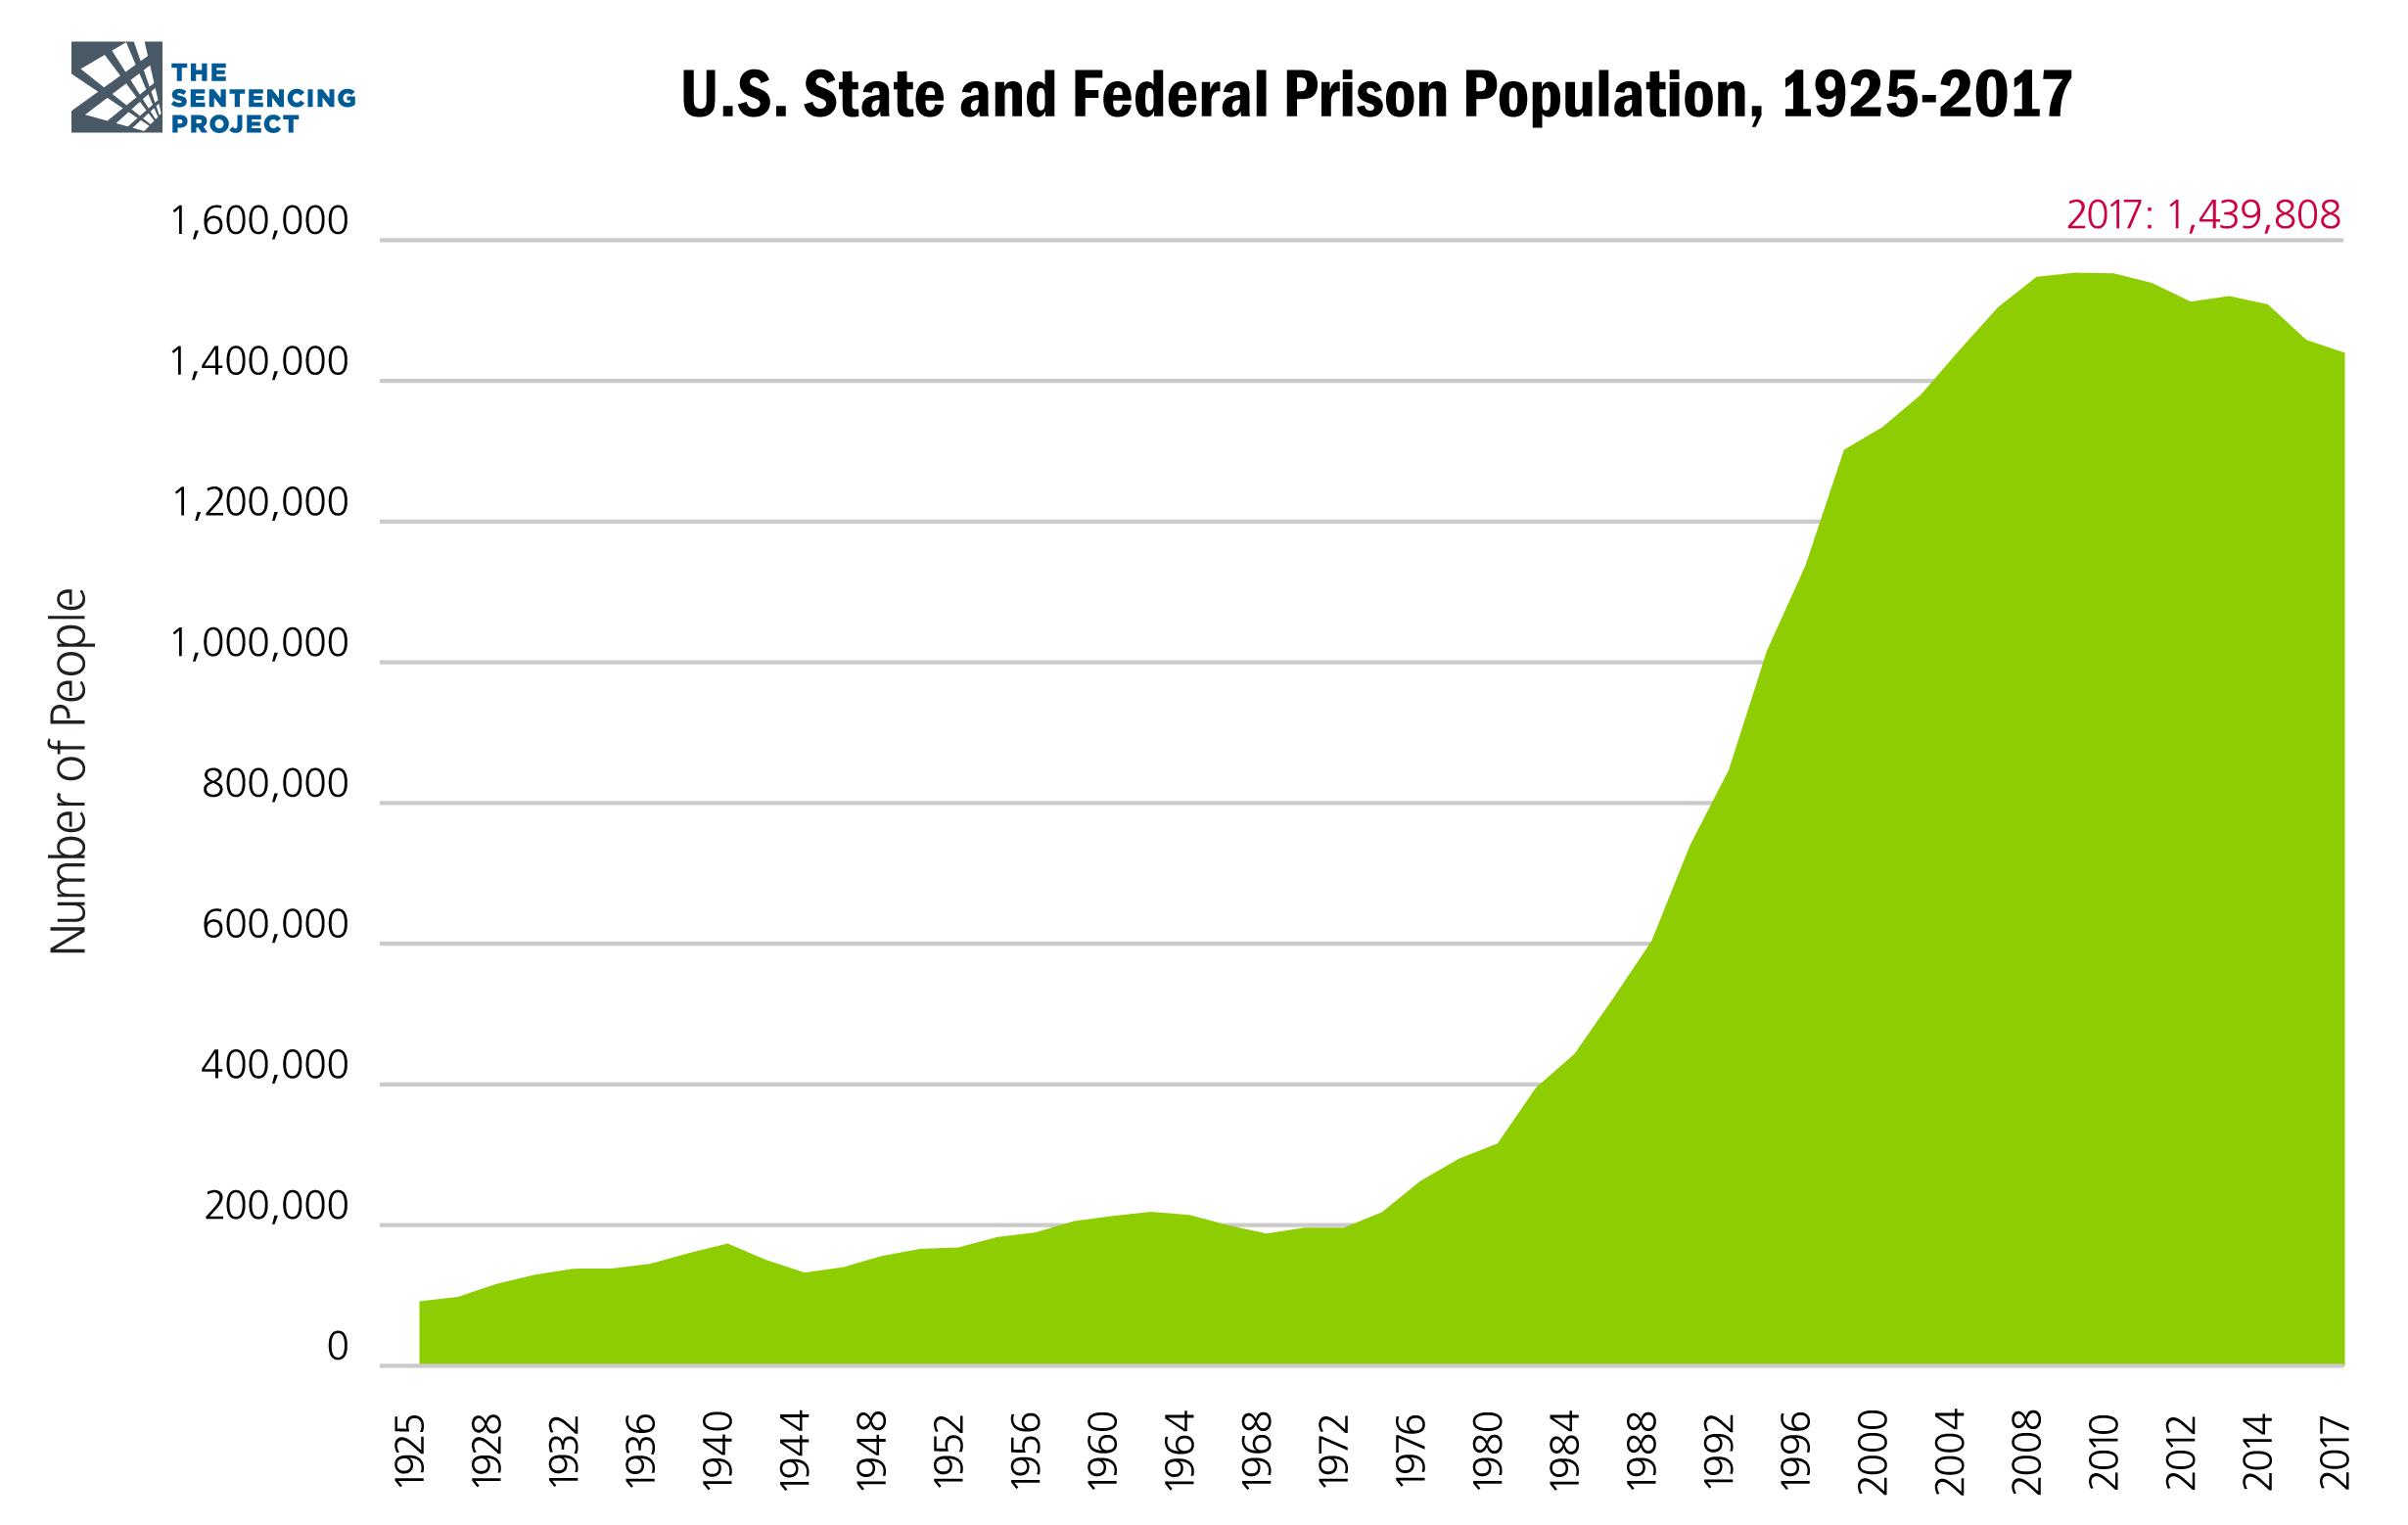 United States Prison Population